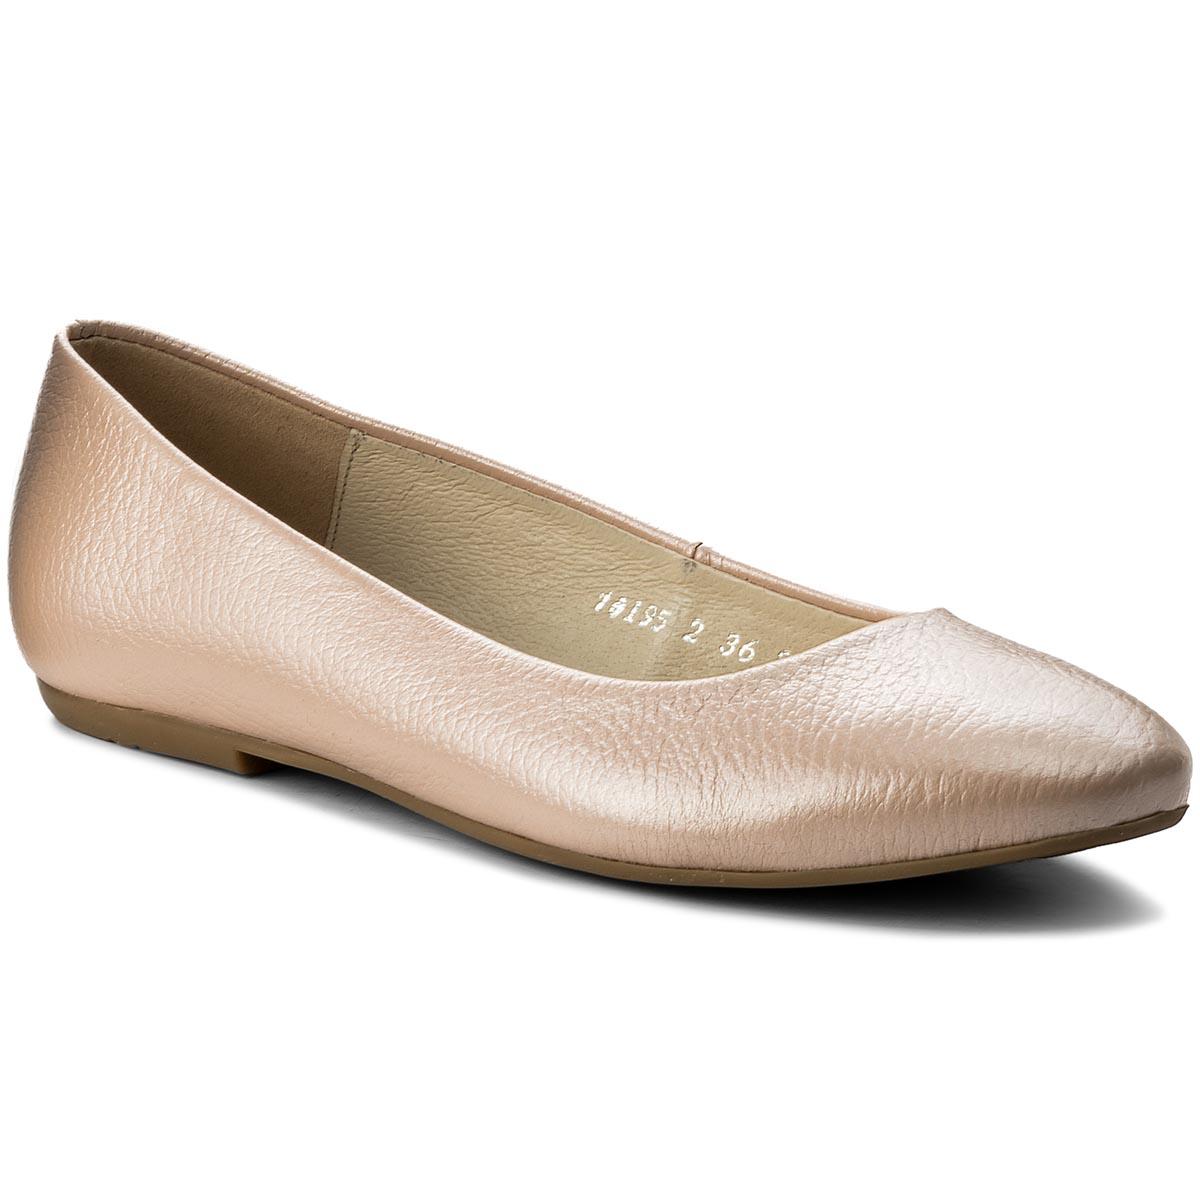 Image of Ballerinas BALDACCINI - 101950-Ł Floter 3